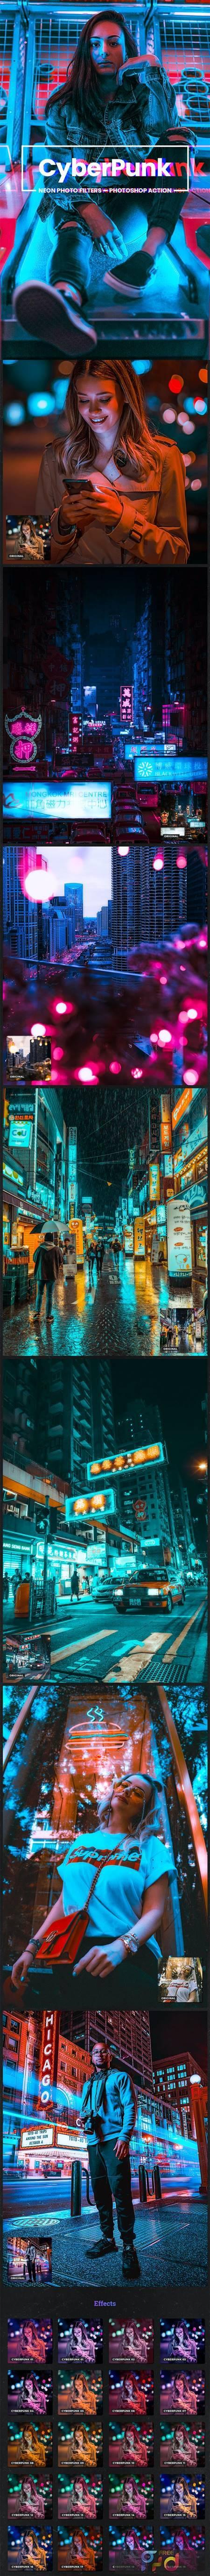 CyberPunk Neon Photo Filters Photoshop Action 26775858 1